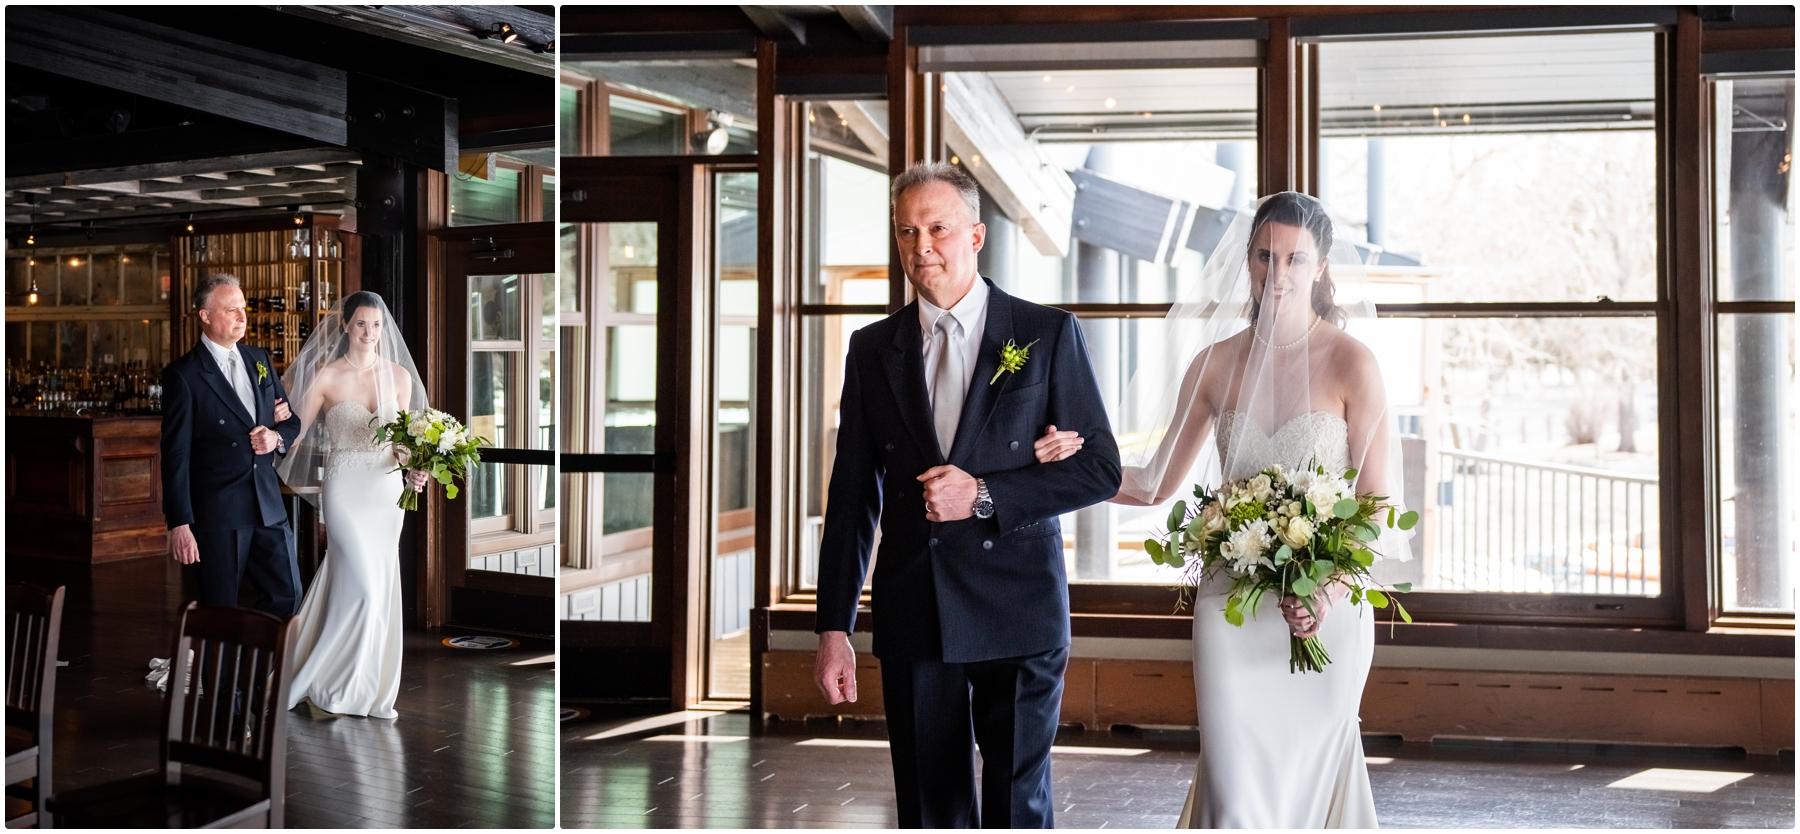 Calgary Lake House Restaurant Micro Wedding Photographers